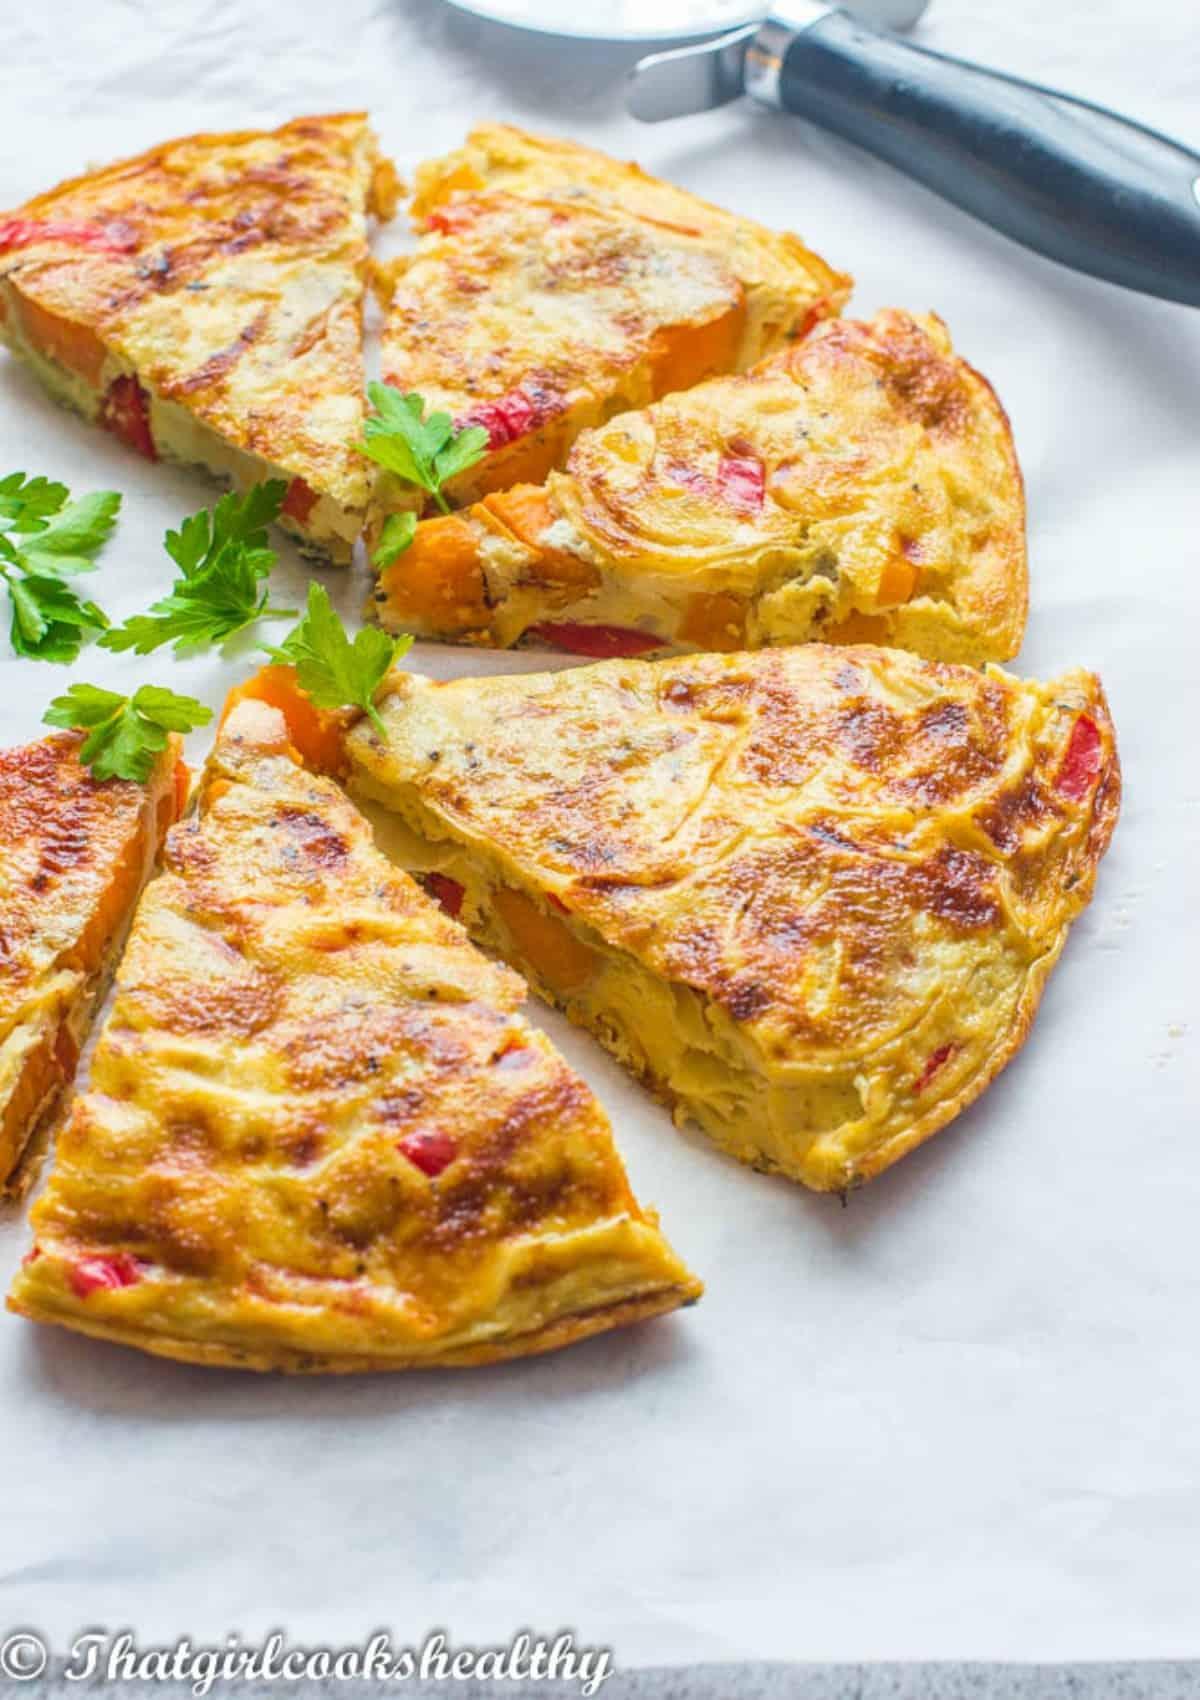 angled shot of the omelette